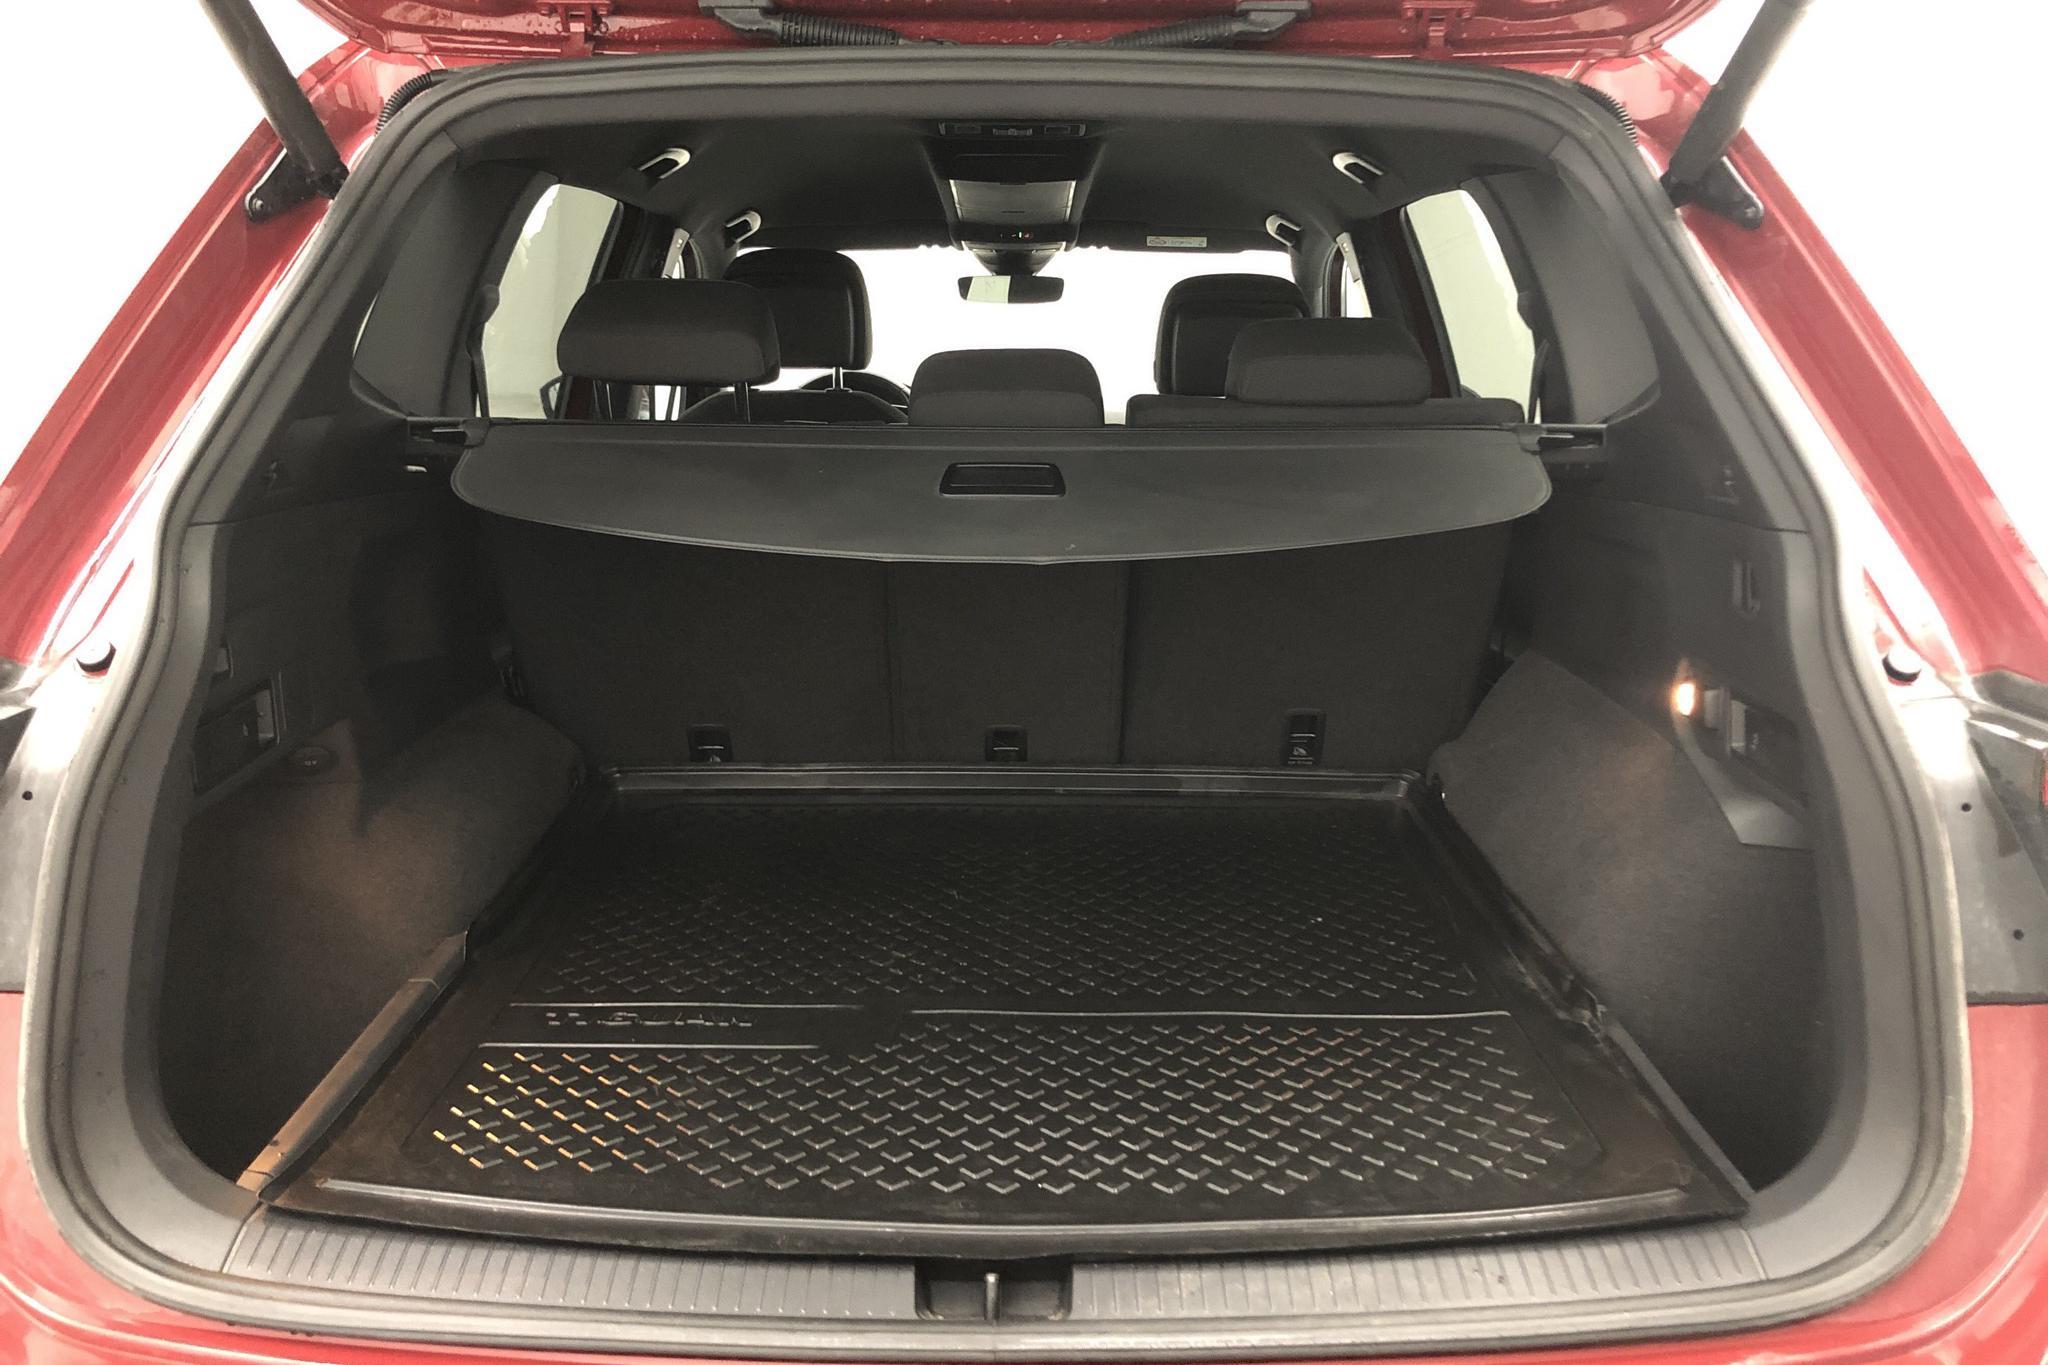 VW Tiguan Allspace 2.0 TDI 4MOTION (190hk) - 1 944 mil - Automat - Dark Red - 2019